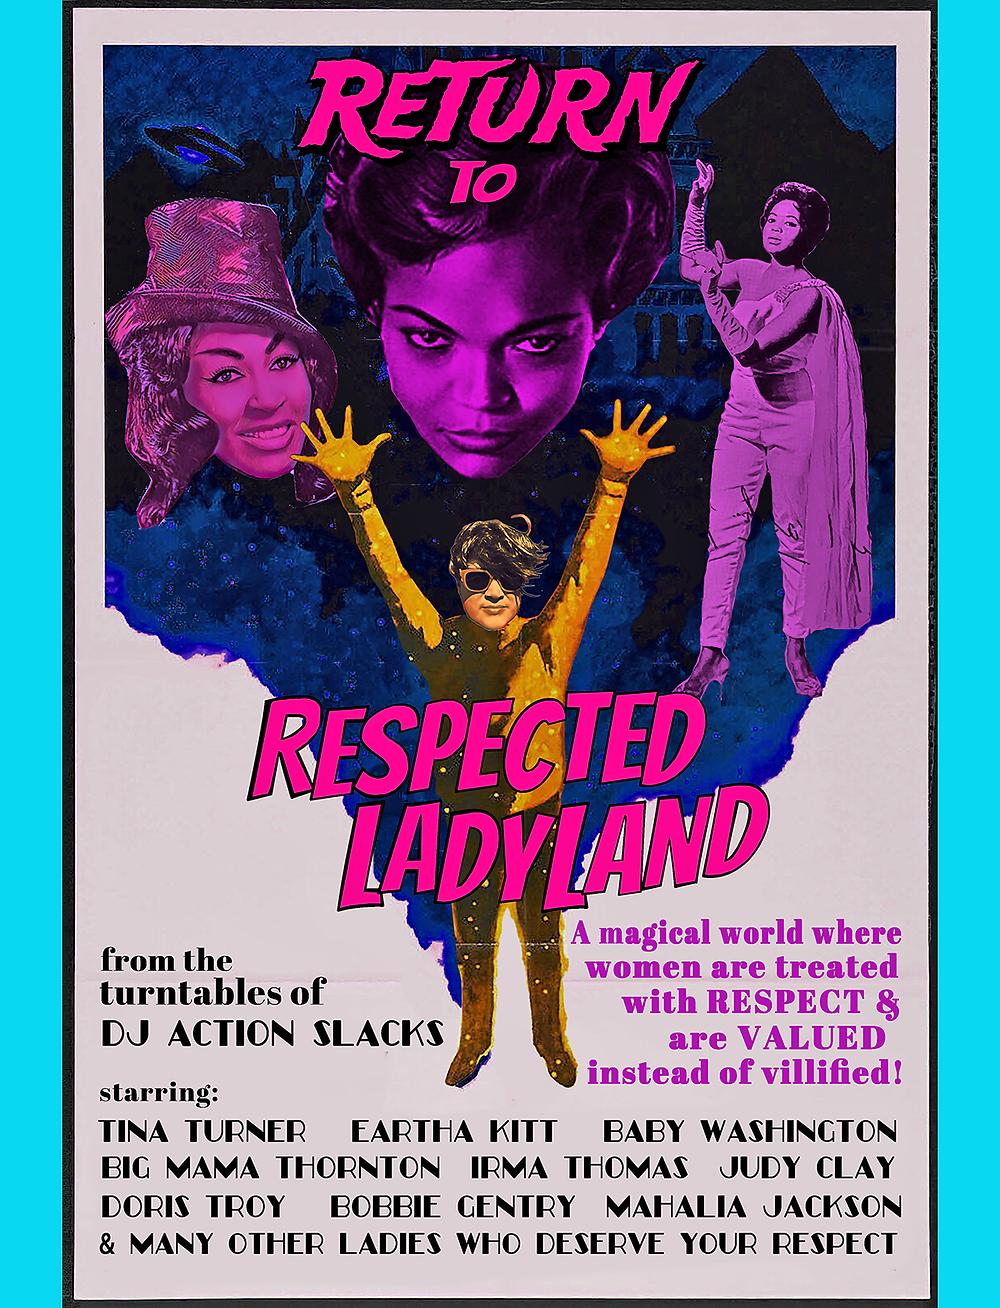 DJ Action Slacks KMHD Return to Respected Ladyland, Portland Jazz Radio, Womens History Month Radio Special, Portland Soul DJ